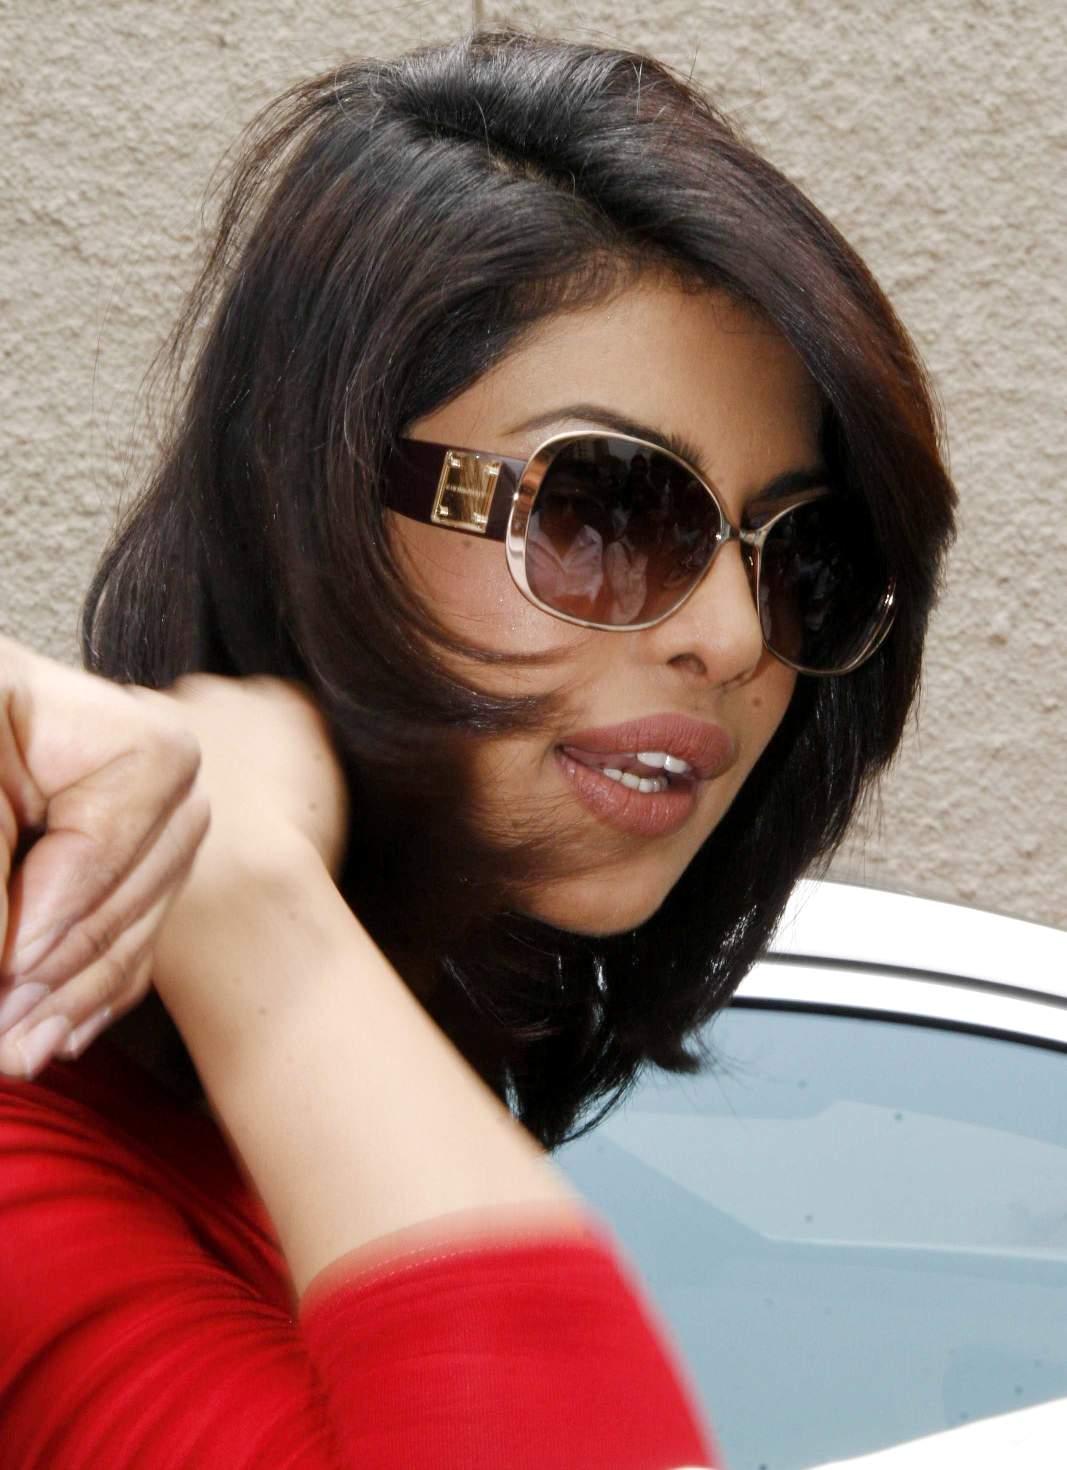 priyanka Chopra beeg - FREE PORN